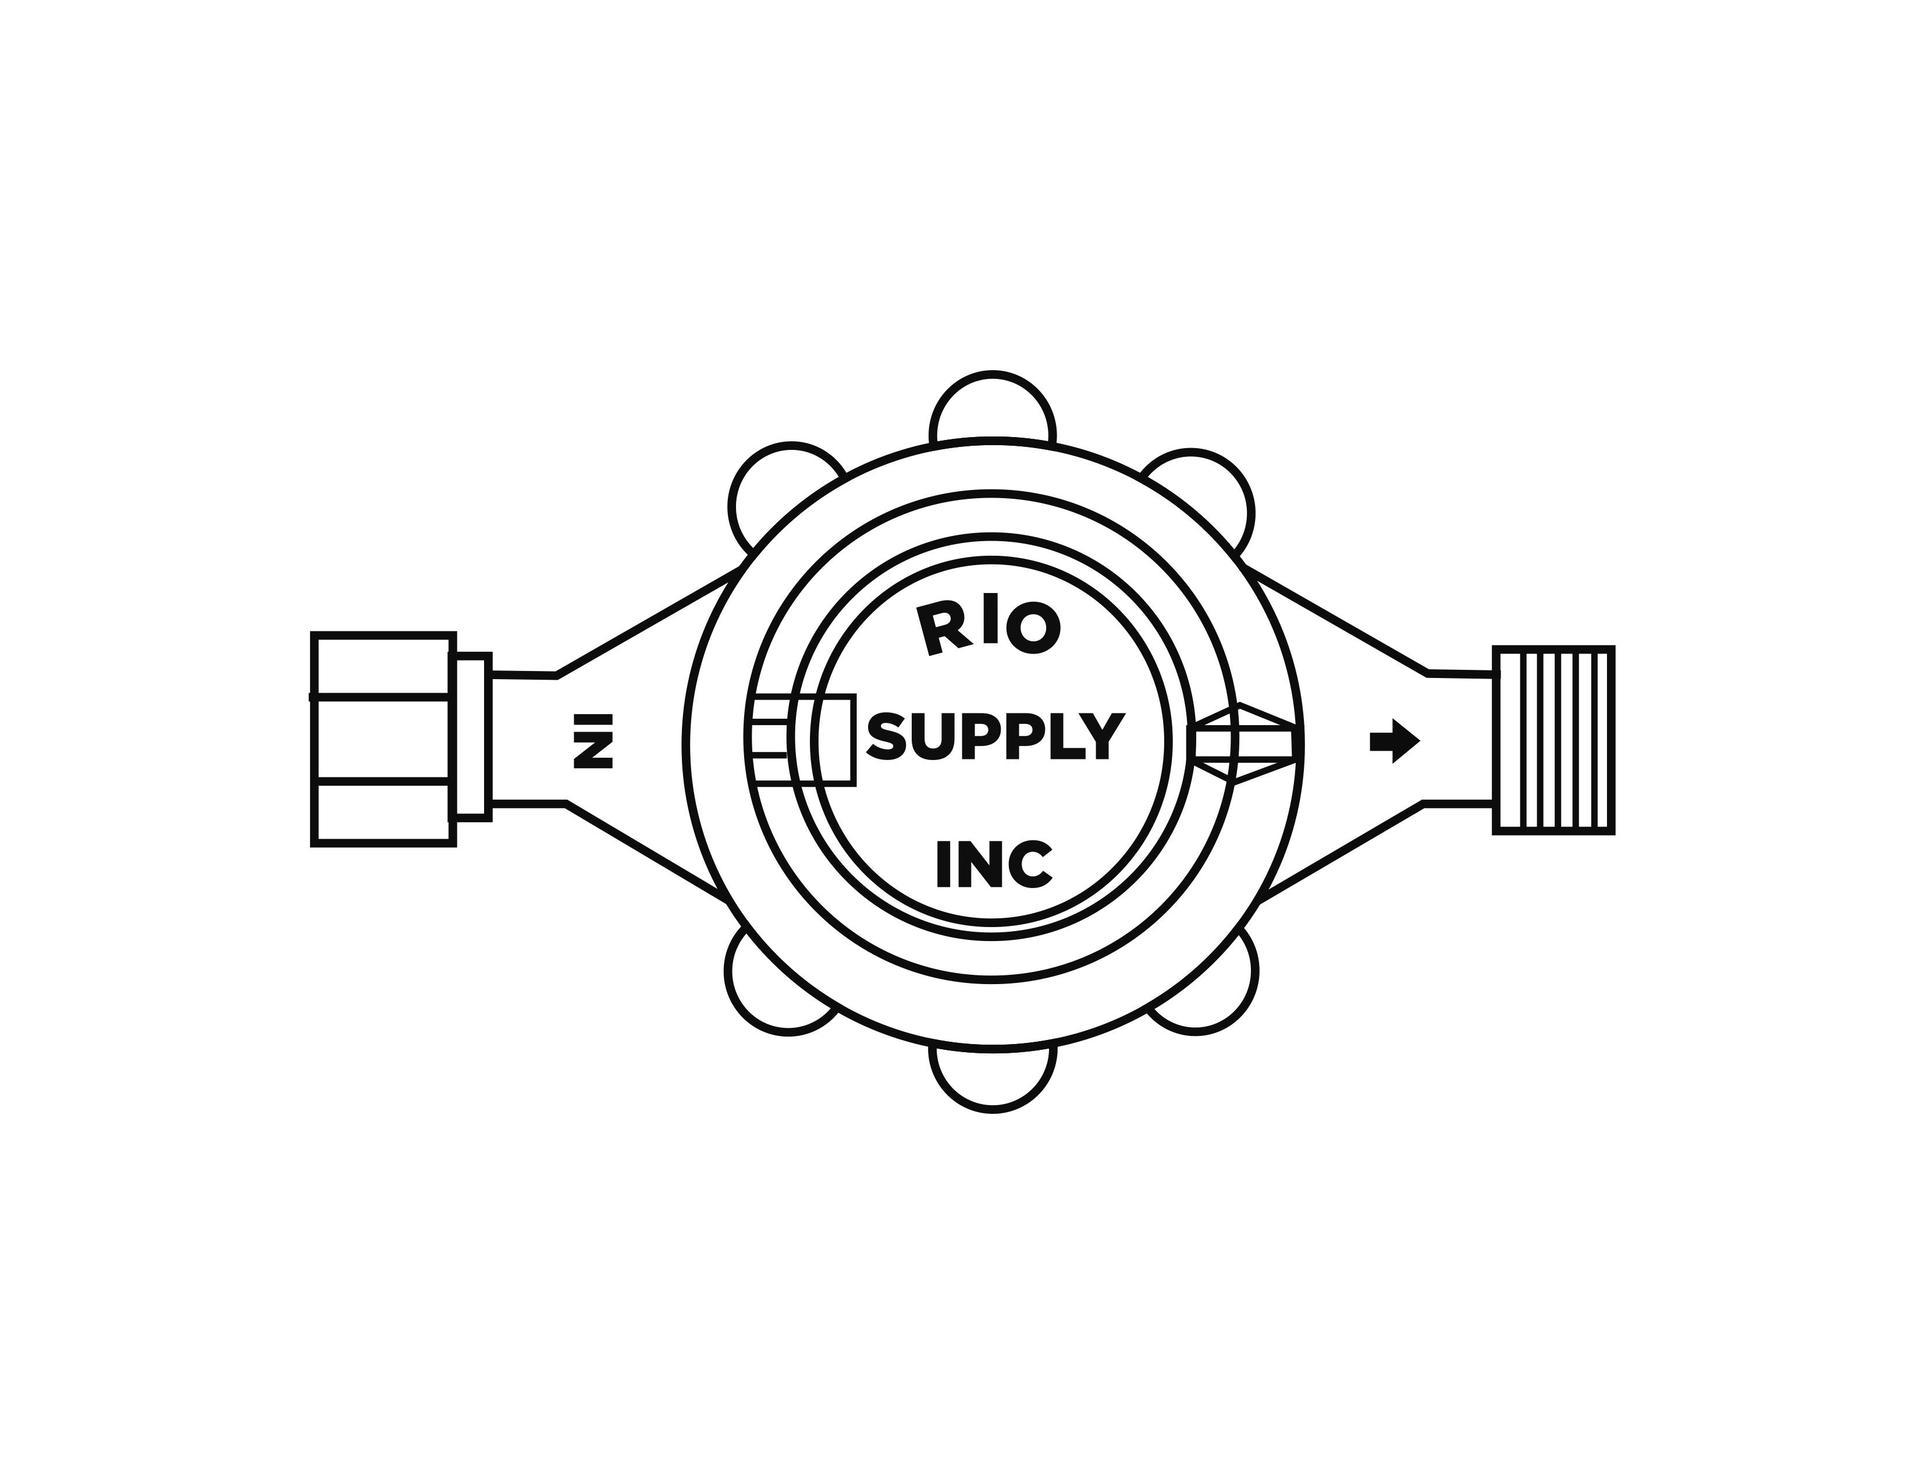 RIO Supply Inc